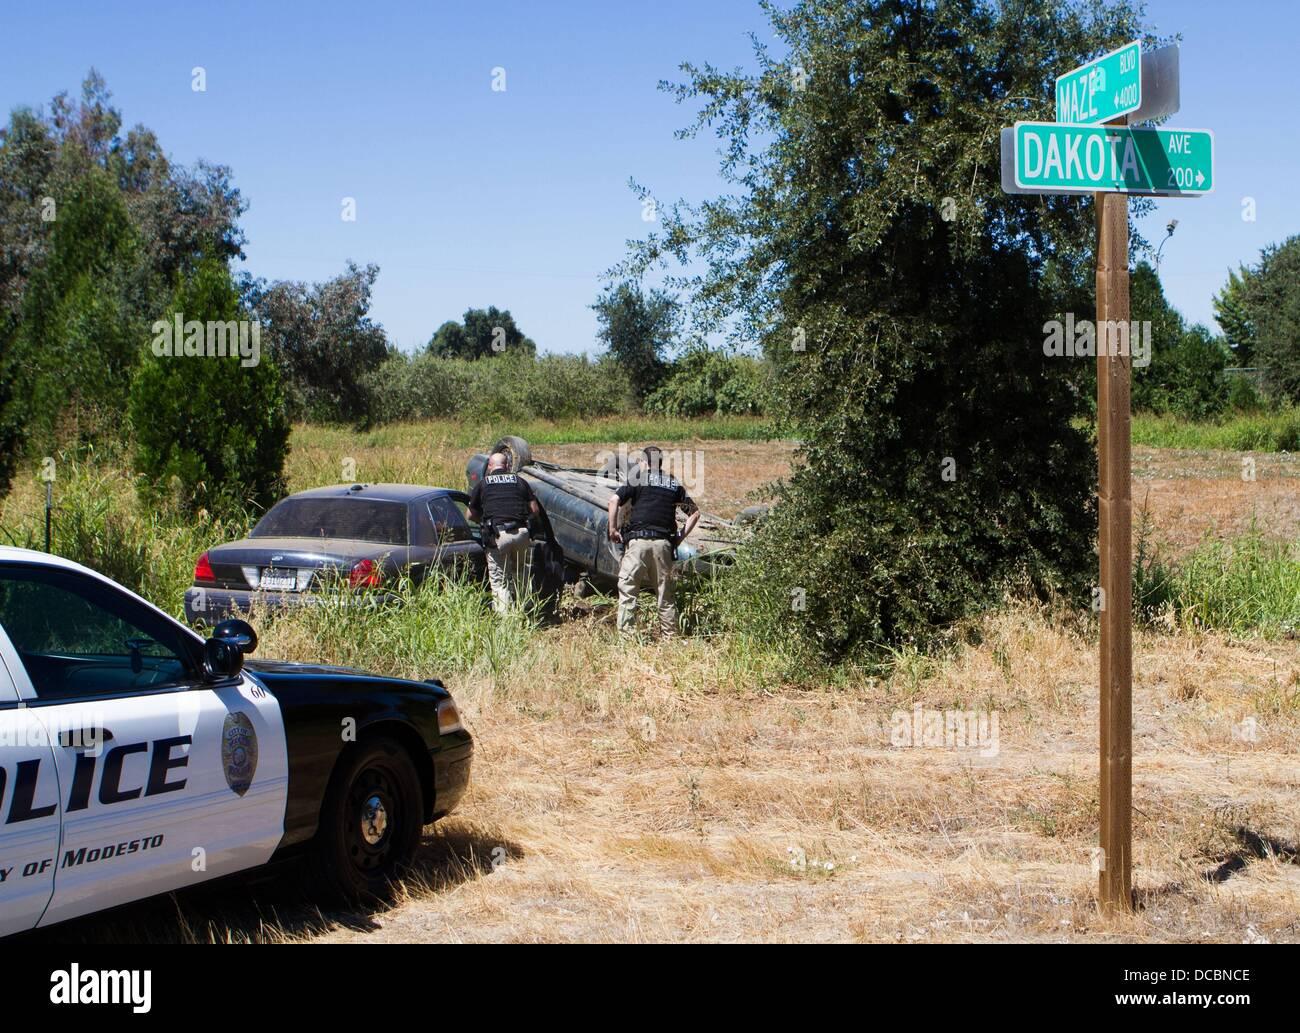 Modesto, CA, USA  14th Aug, 2013  Modesto Police officers